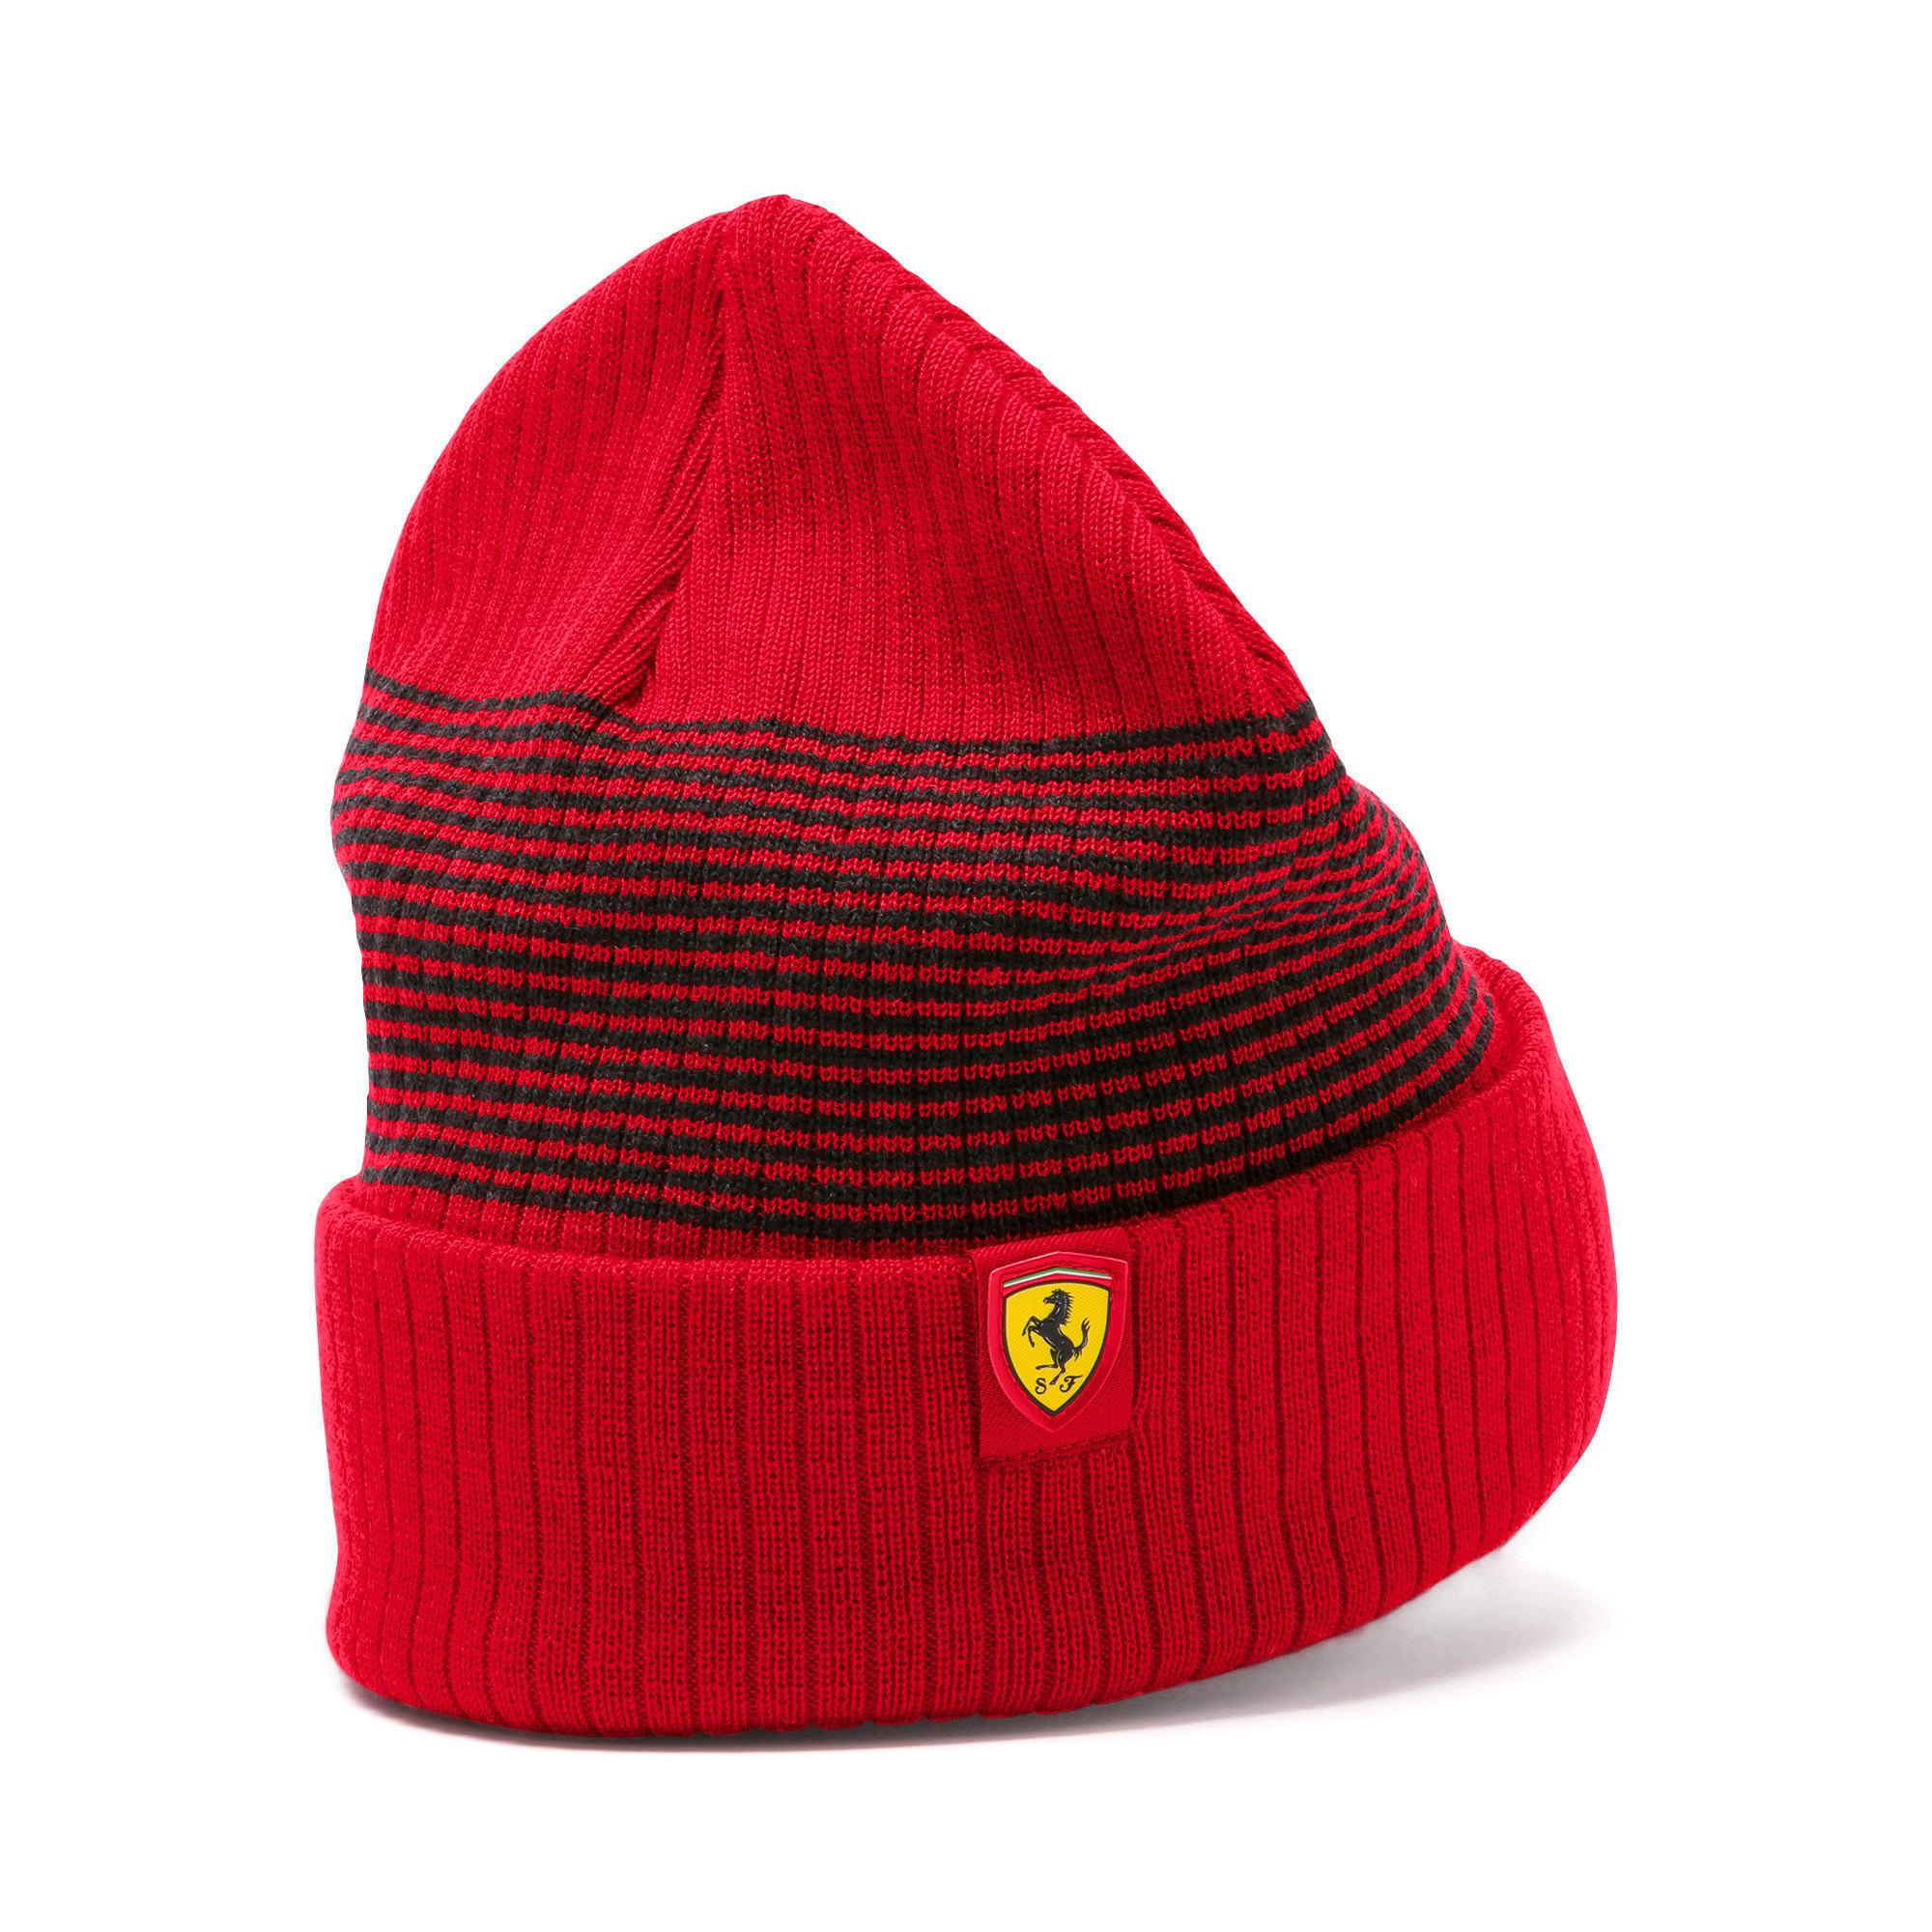 Thumbnail 2 of Ferrari Fanwear Beanie, Rosso Corsa, medium-IND